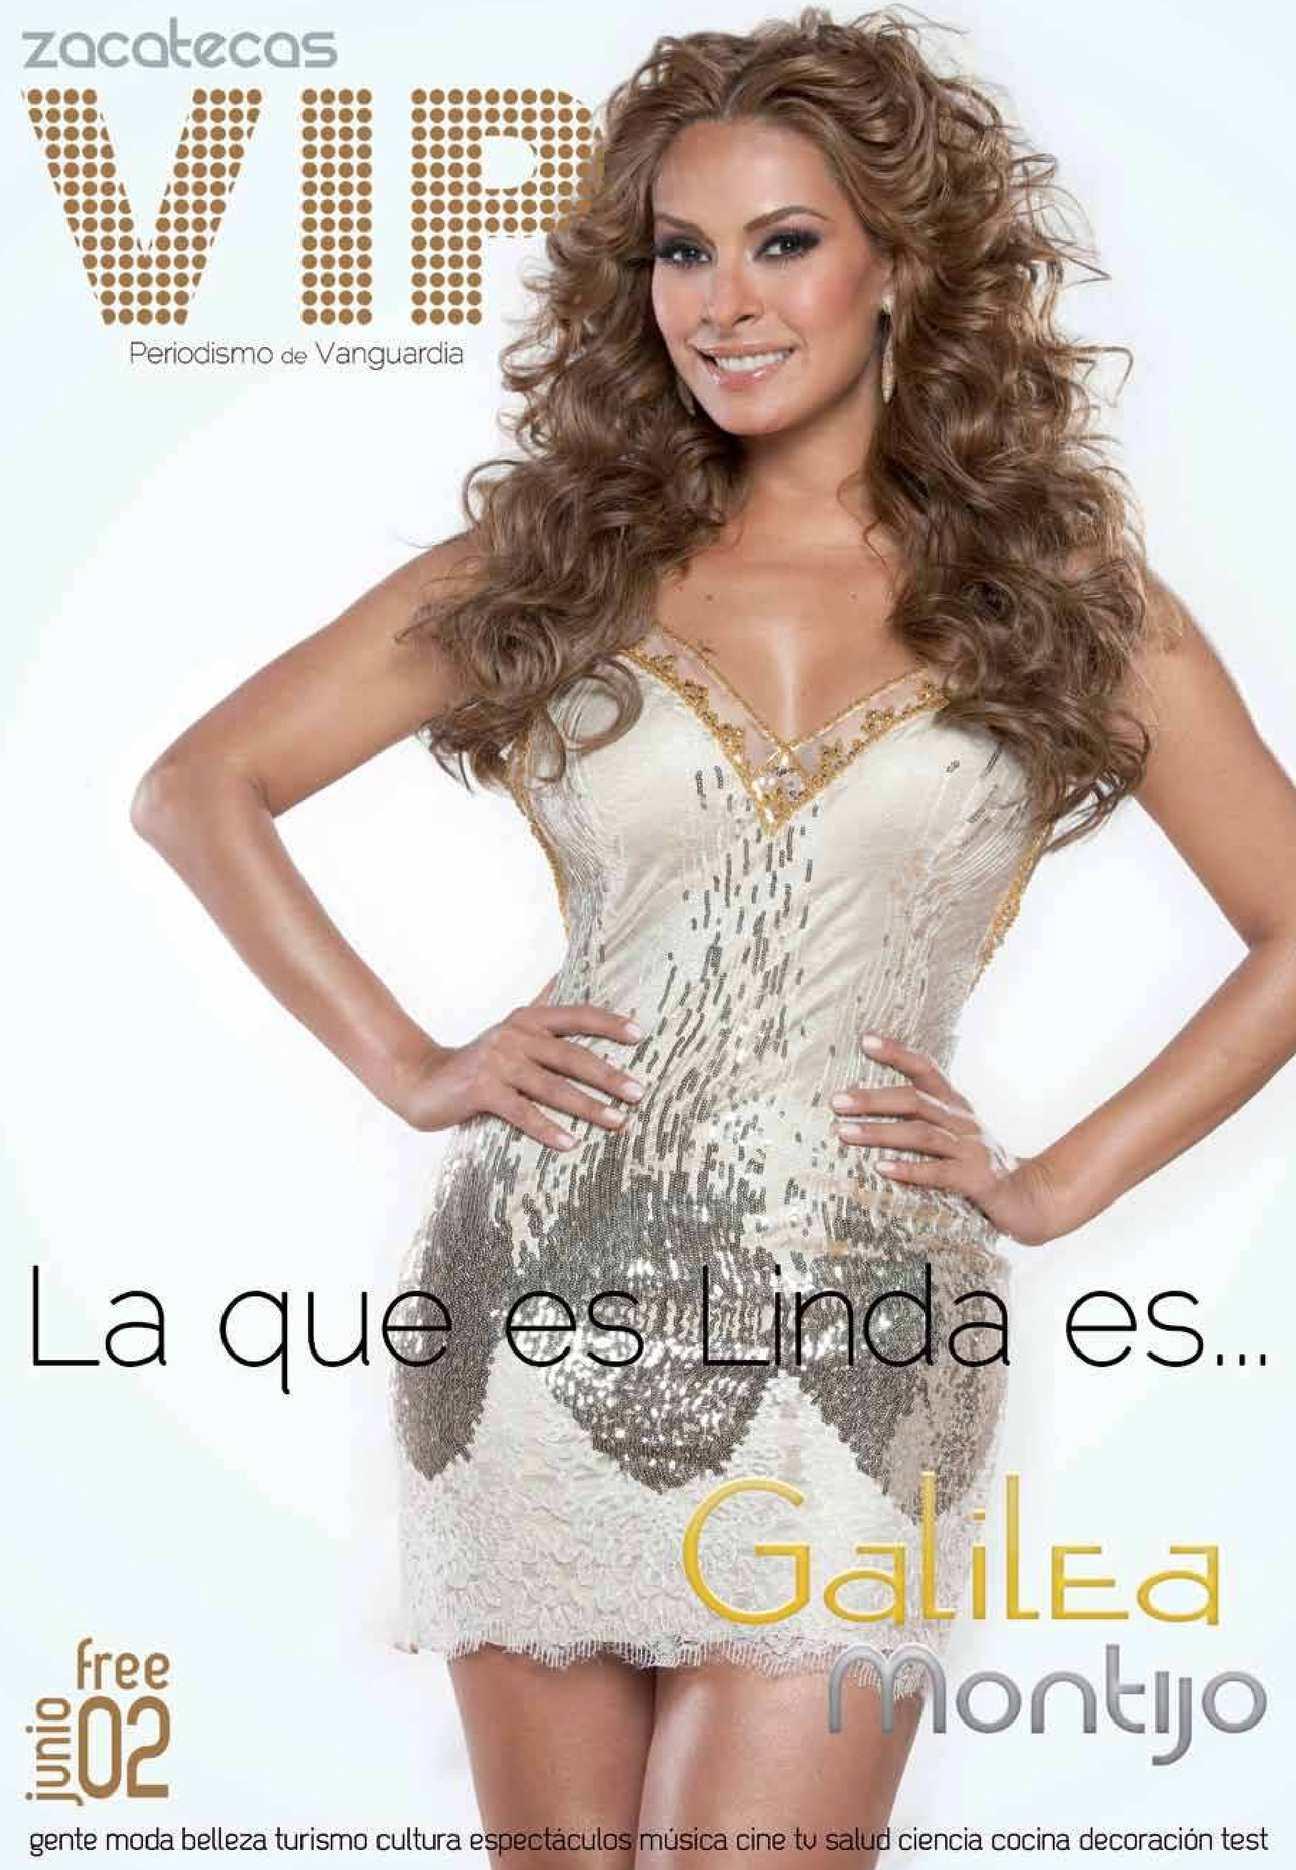 Calaméo - Zacatecas VIP 02 087b1a08c64a